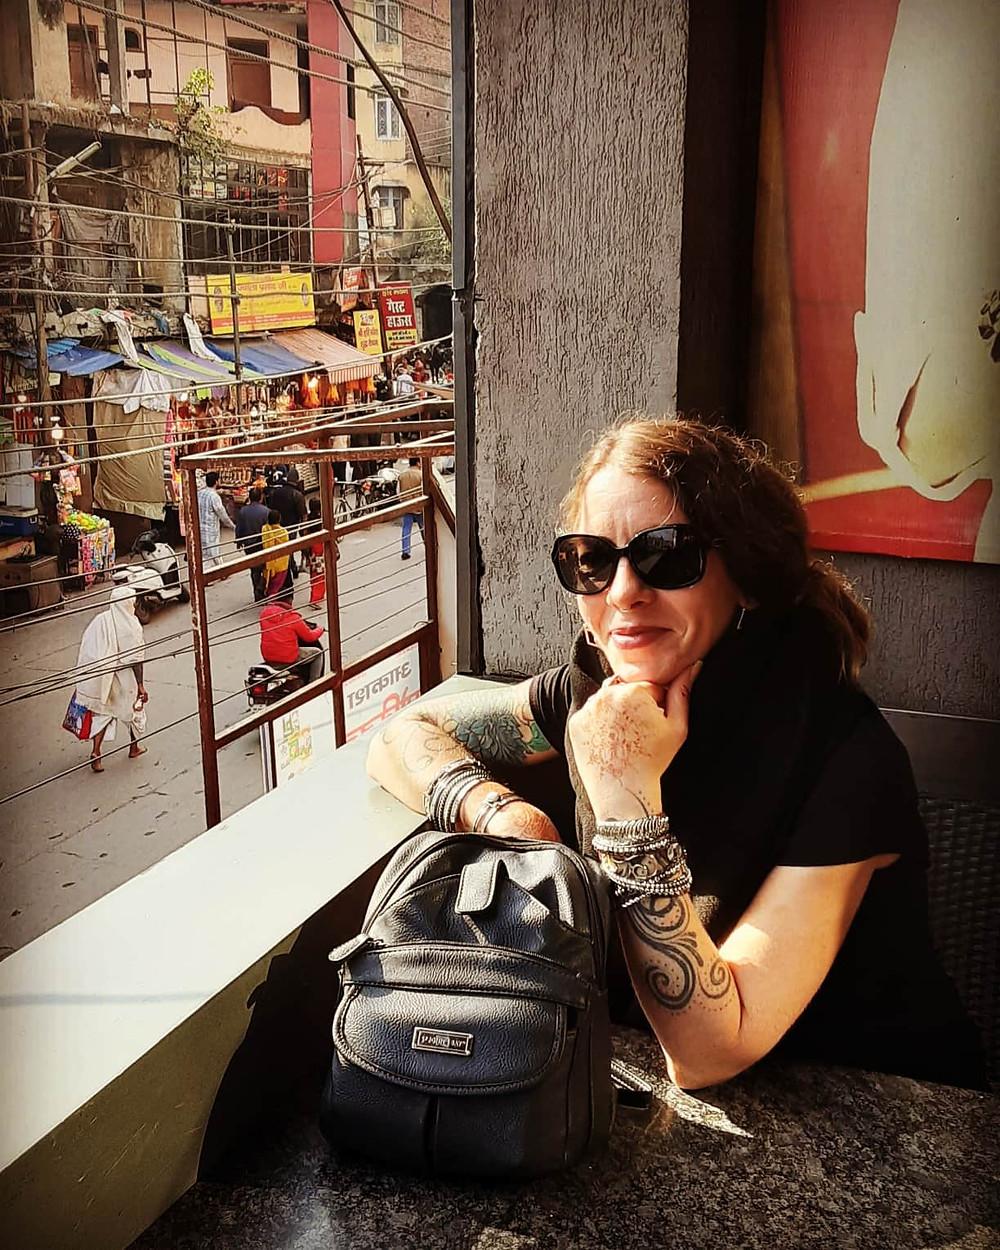 Cafe in Haridwar, India